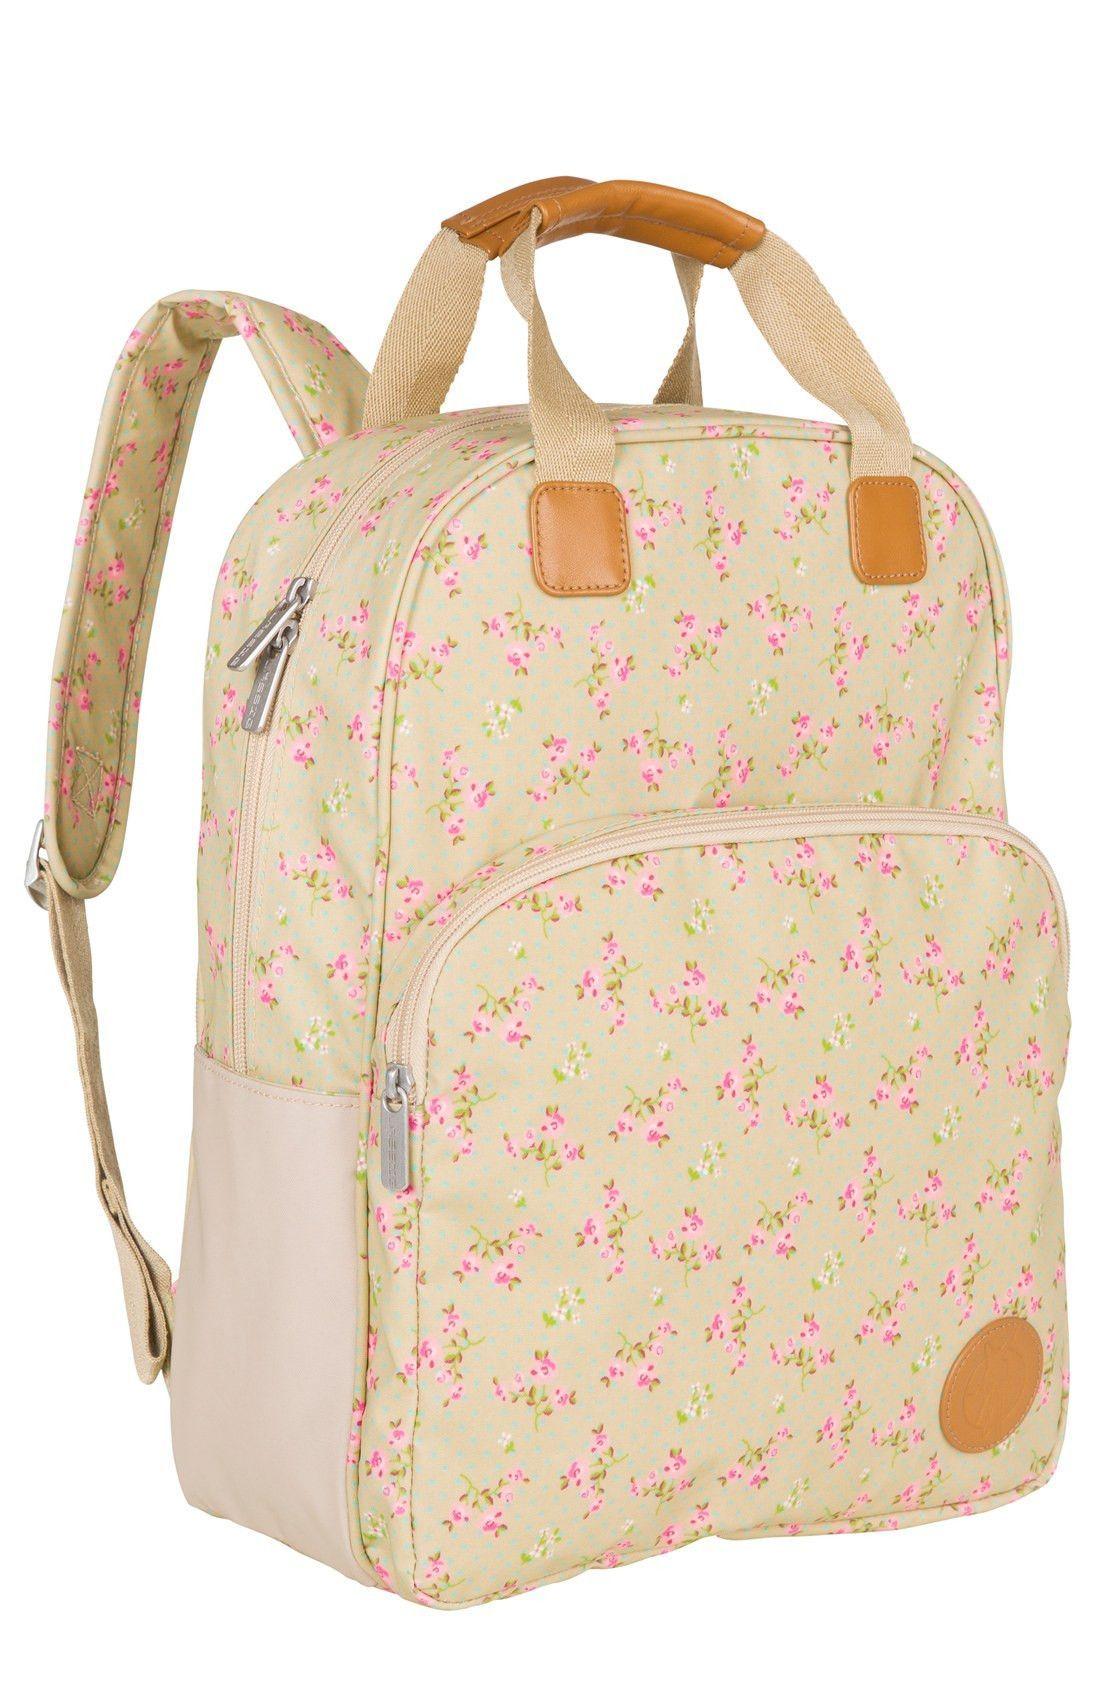 'The Vintage' Diaper Backpack